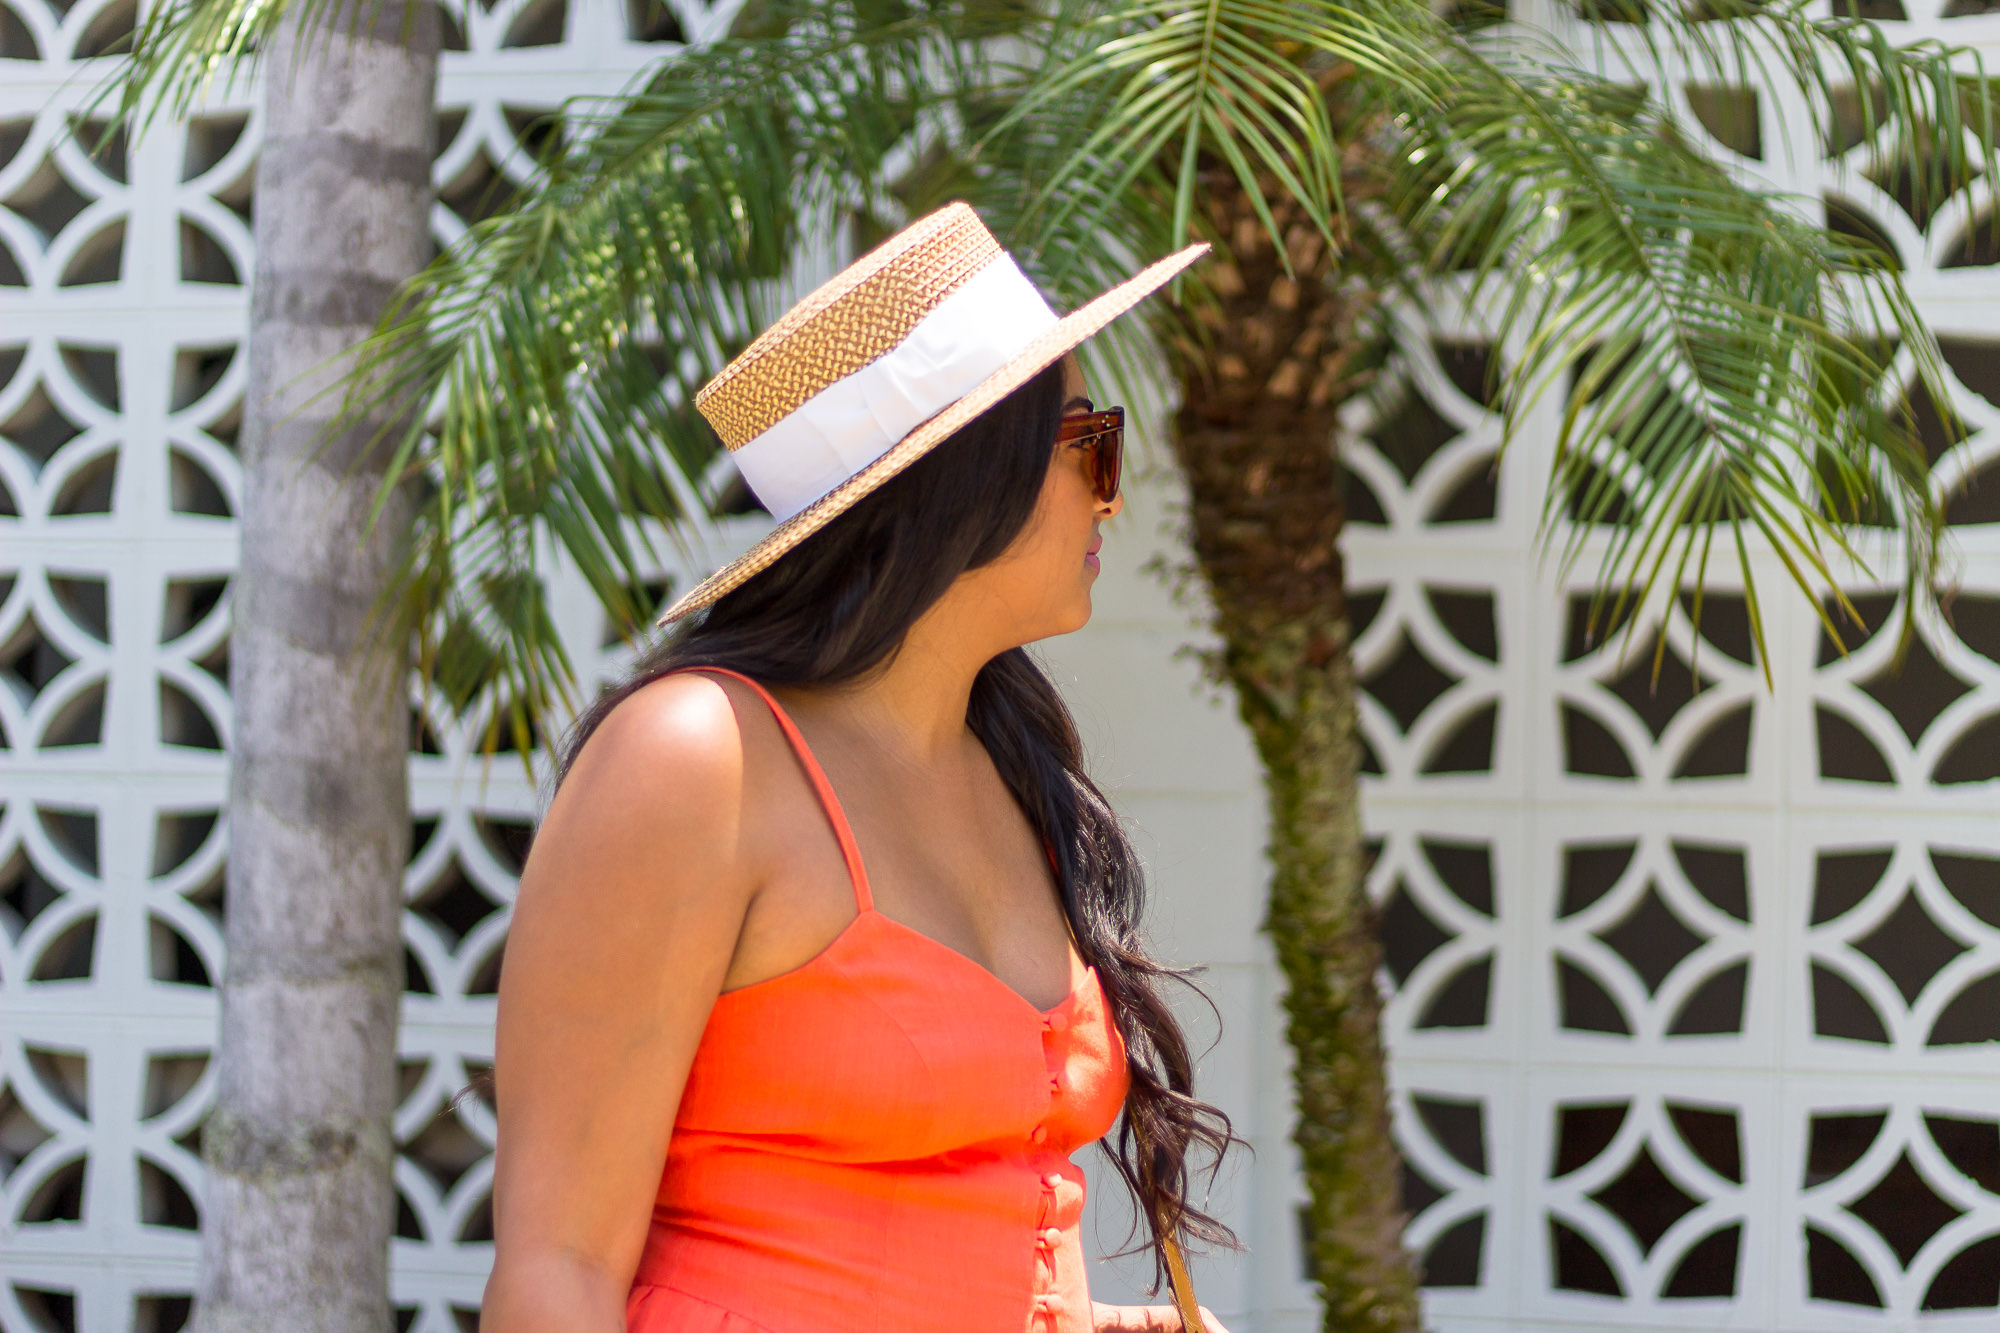 eric-javits-summer-boater-hat